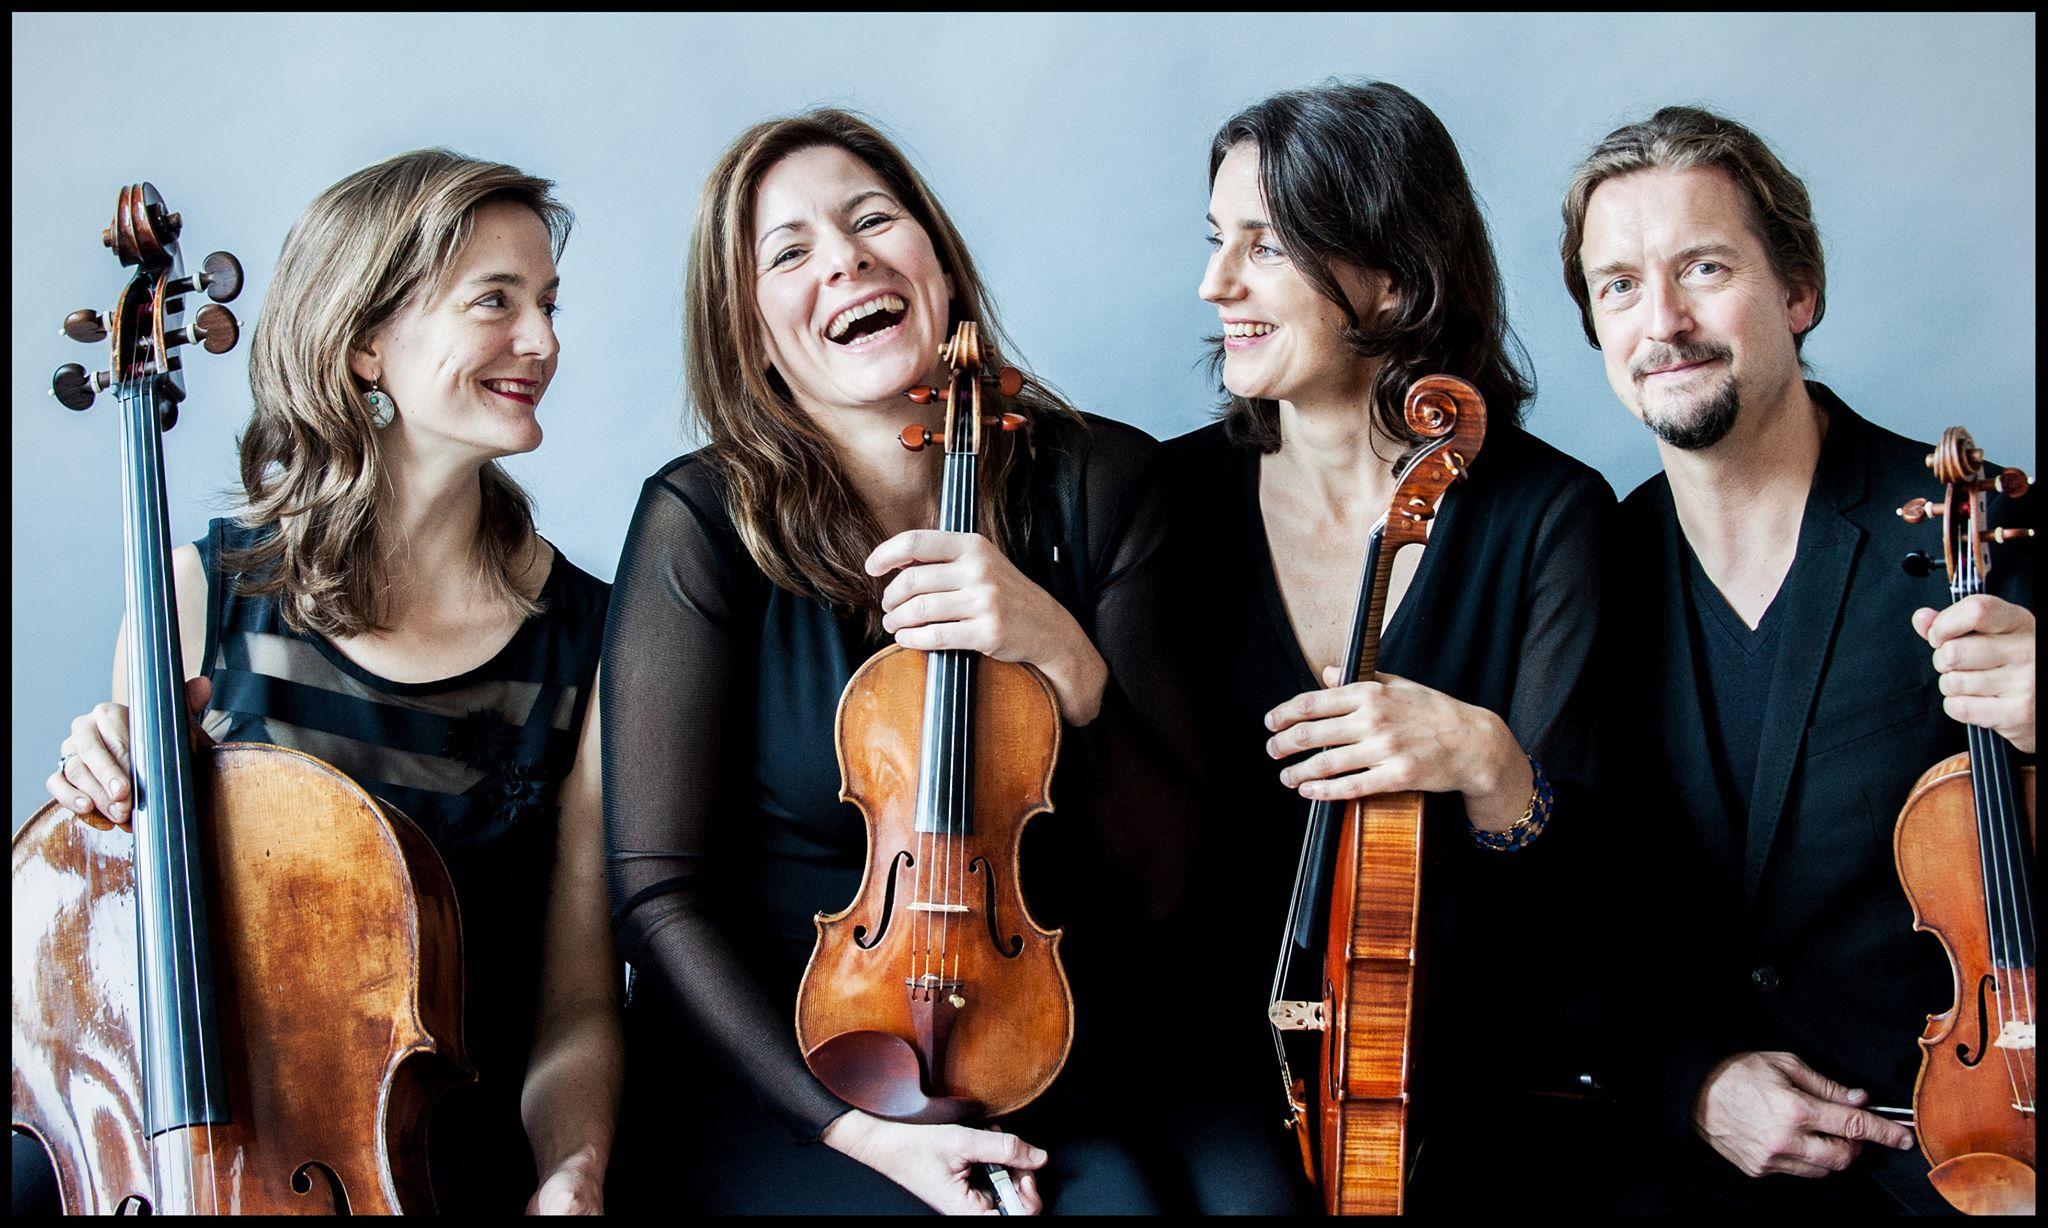 Srebrni abonma: Godalni kvartet Tetzlaff @Slovenska filharmonija, 14. 1. 2020